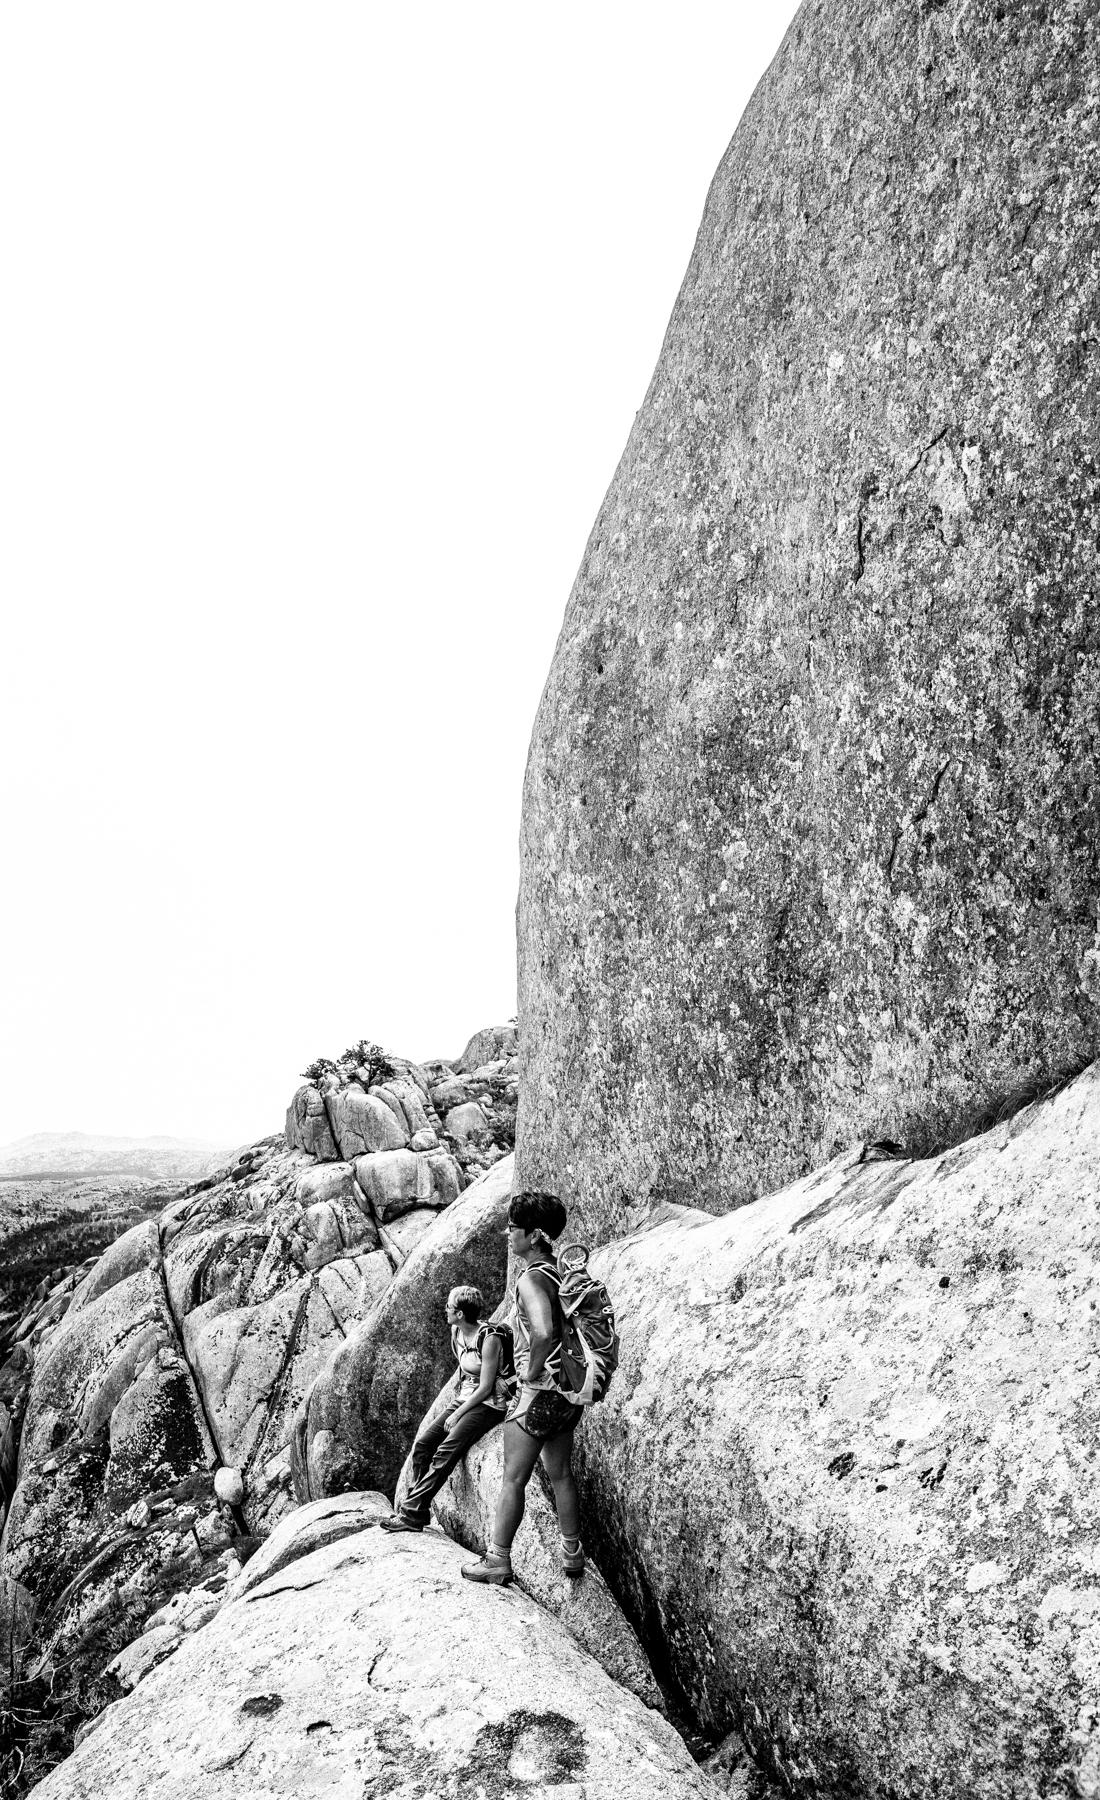 2017-06-25 Mount Lincoln B (19 of 20).jpg